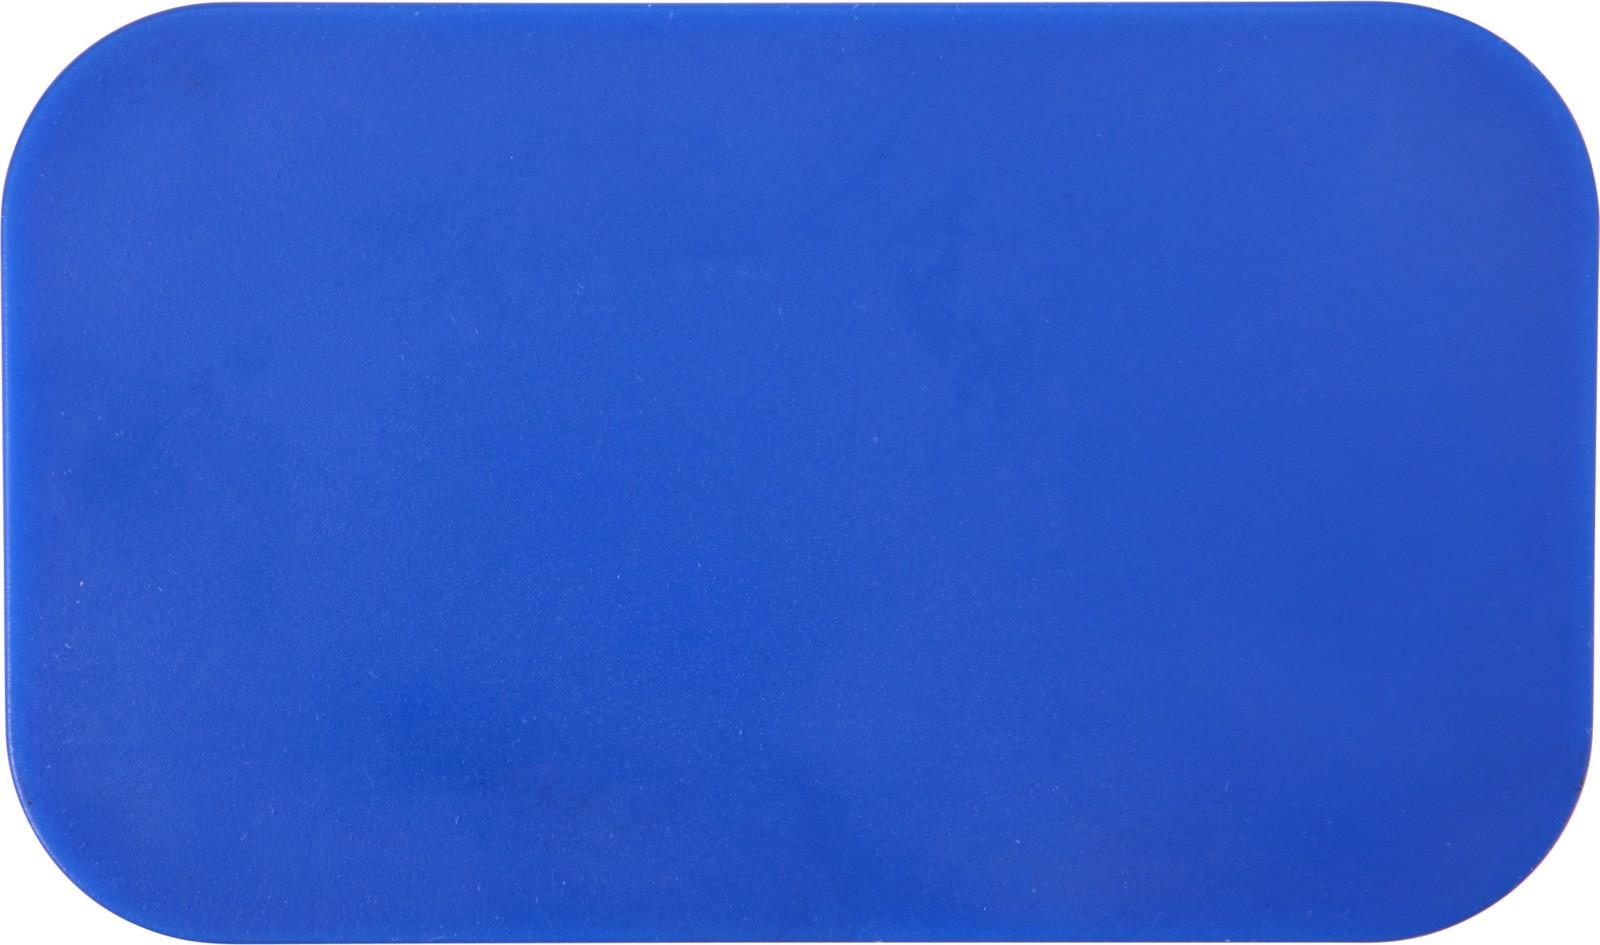 ABS speaker - Cobalt Blue